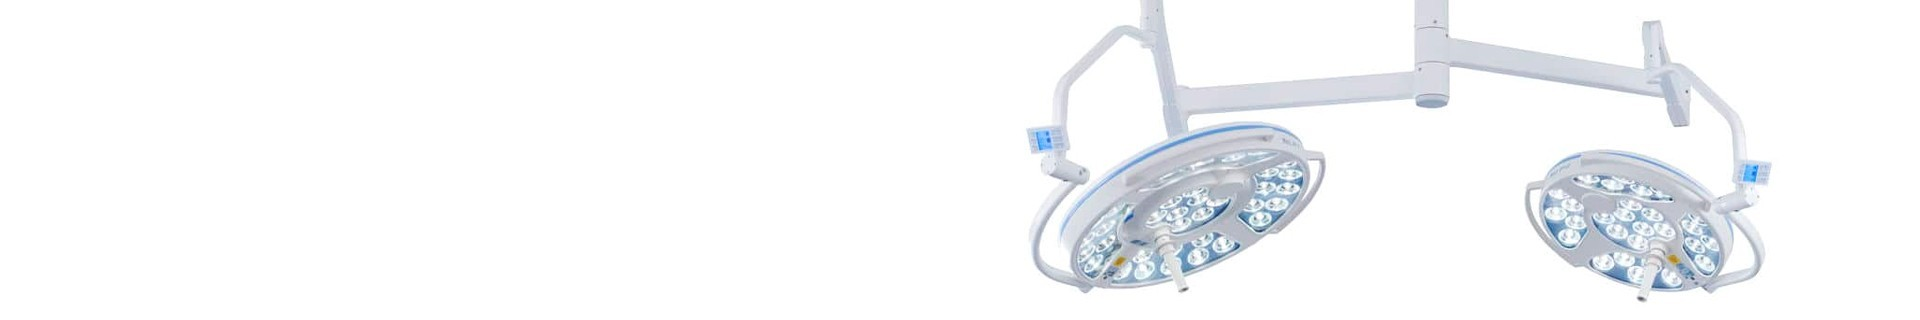 Lampi chirurgie